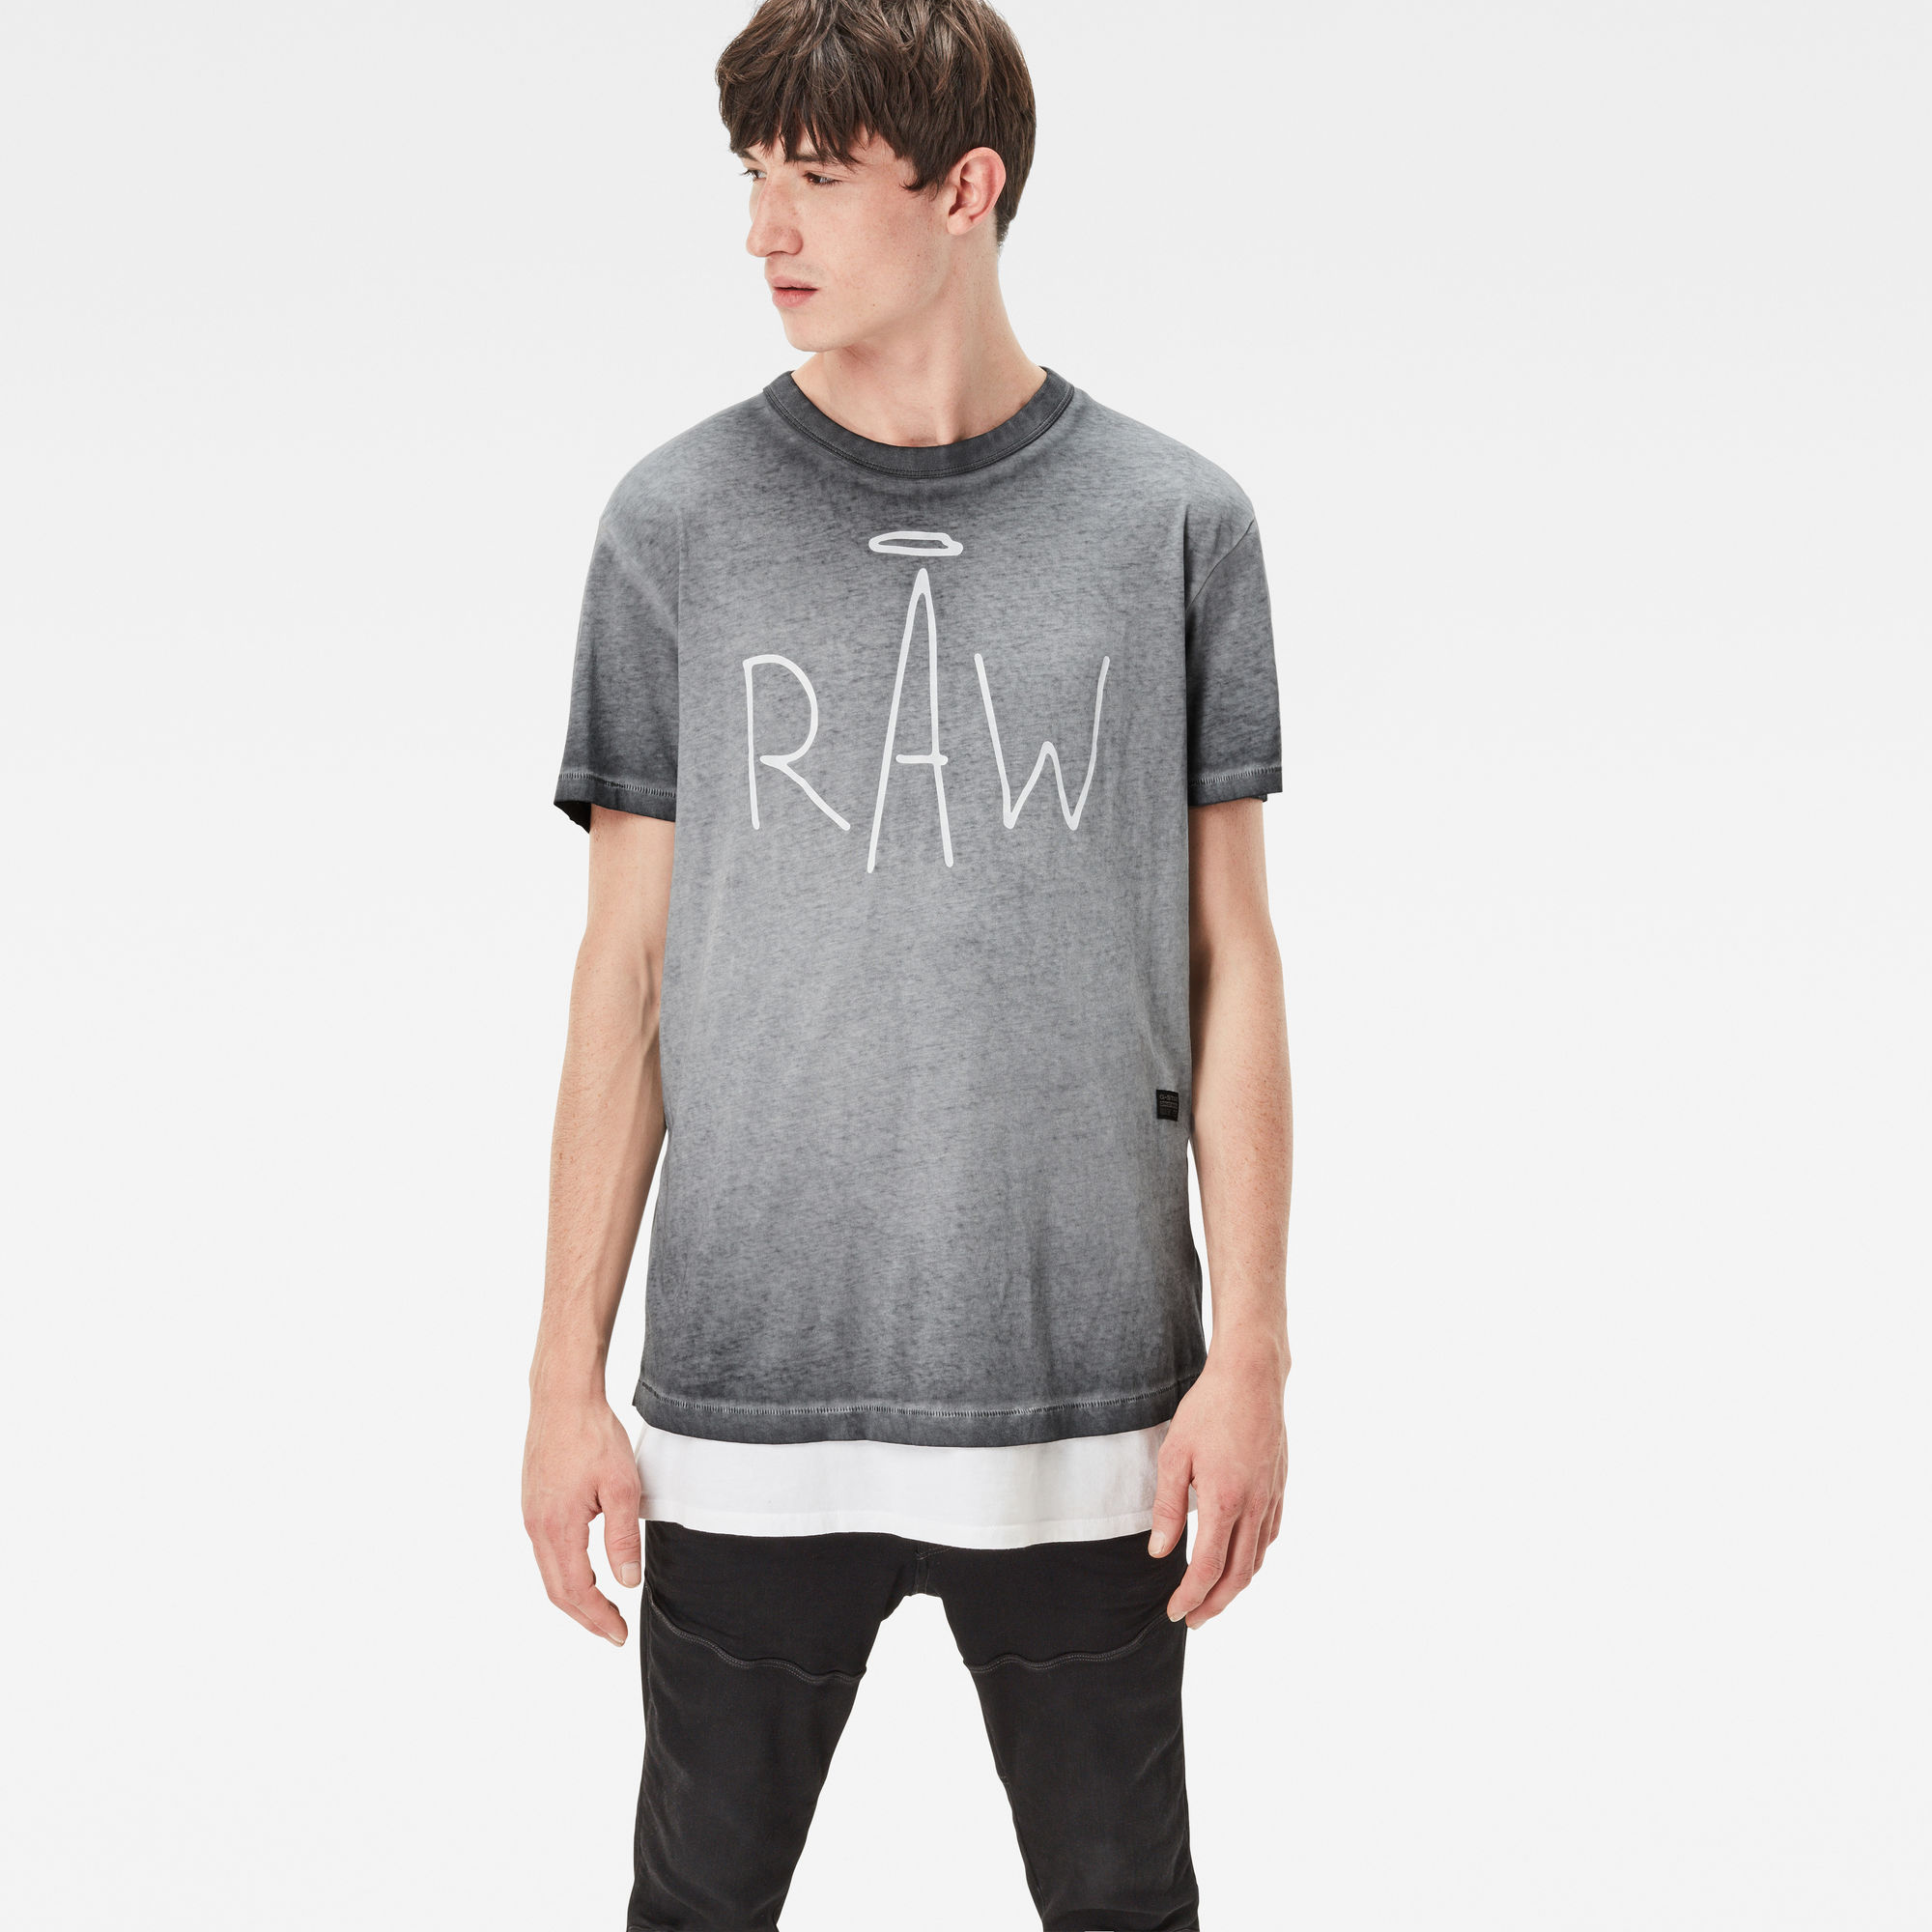 Asteron T-Shirt